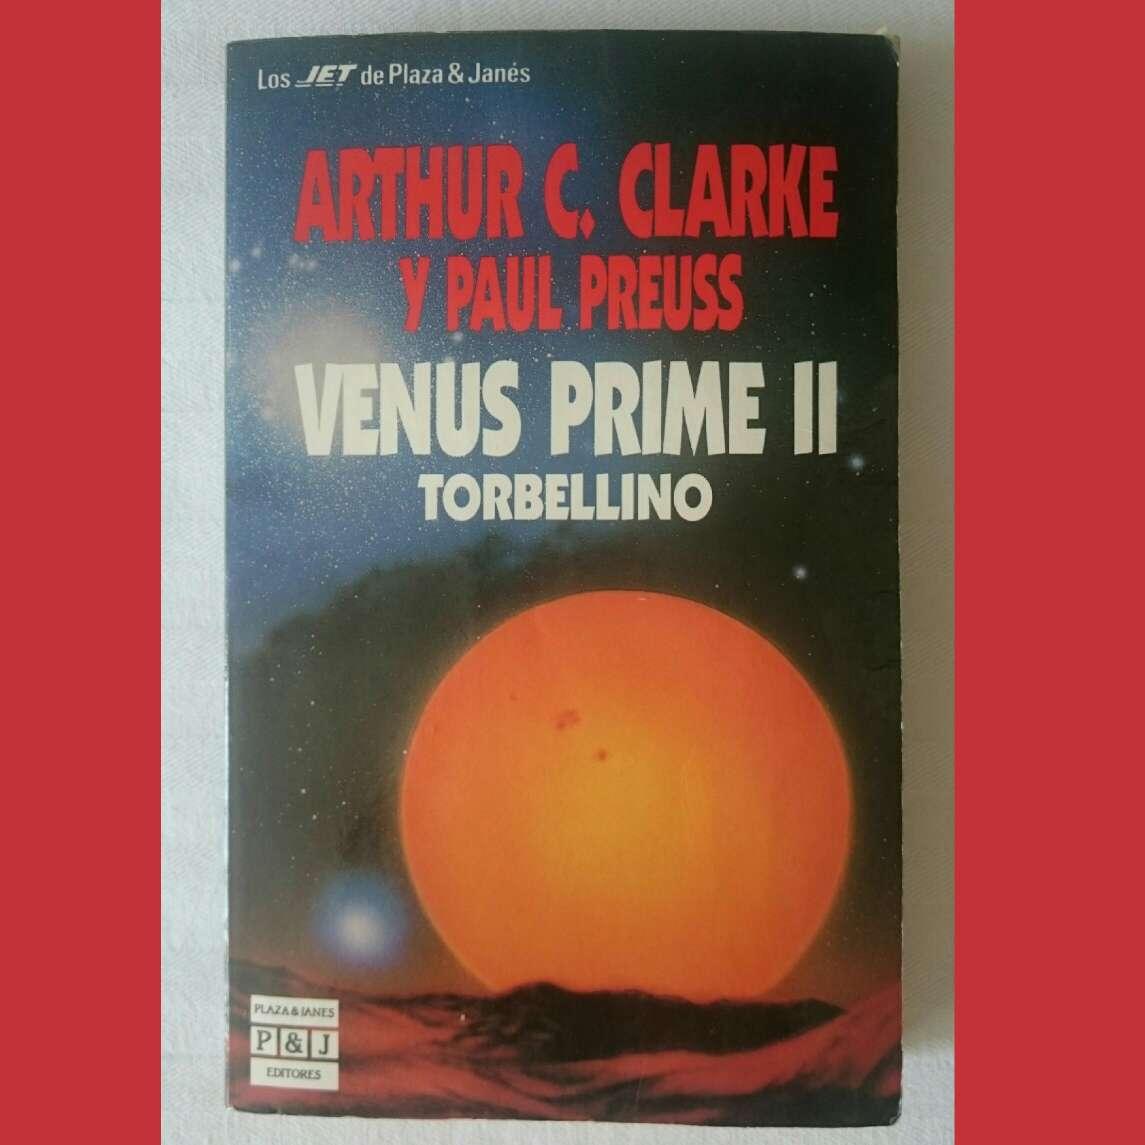 Imagen Venus Prime II Torbellino